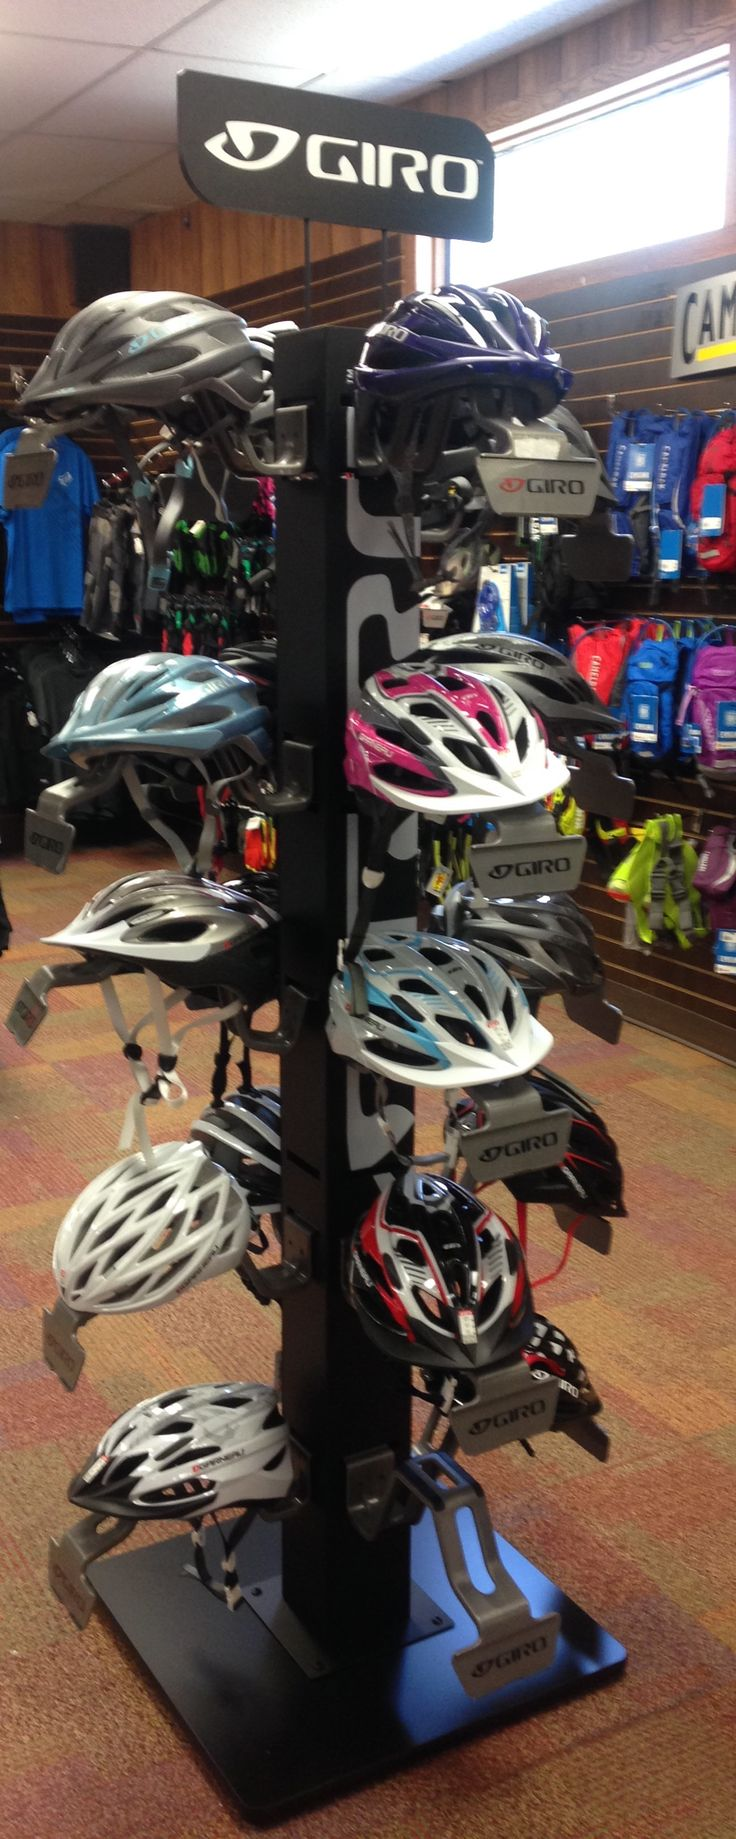 Don't forget your helmet! #SafetyFirst